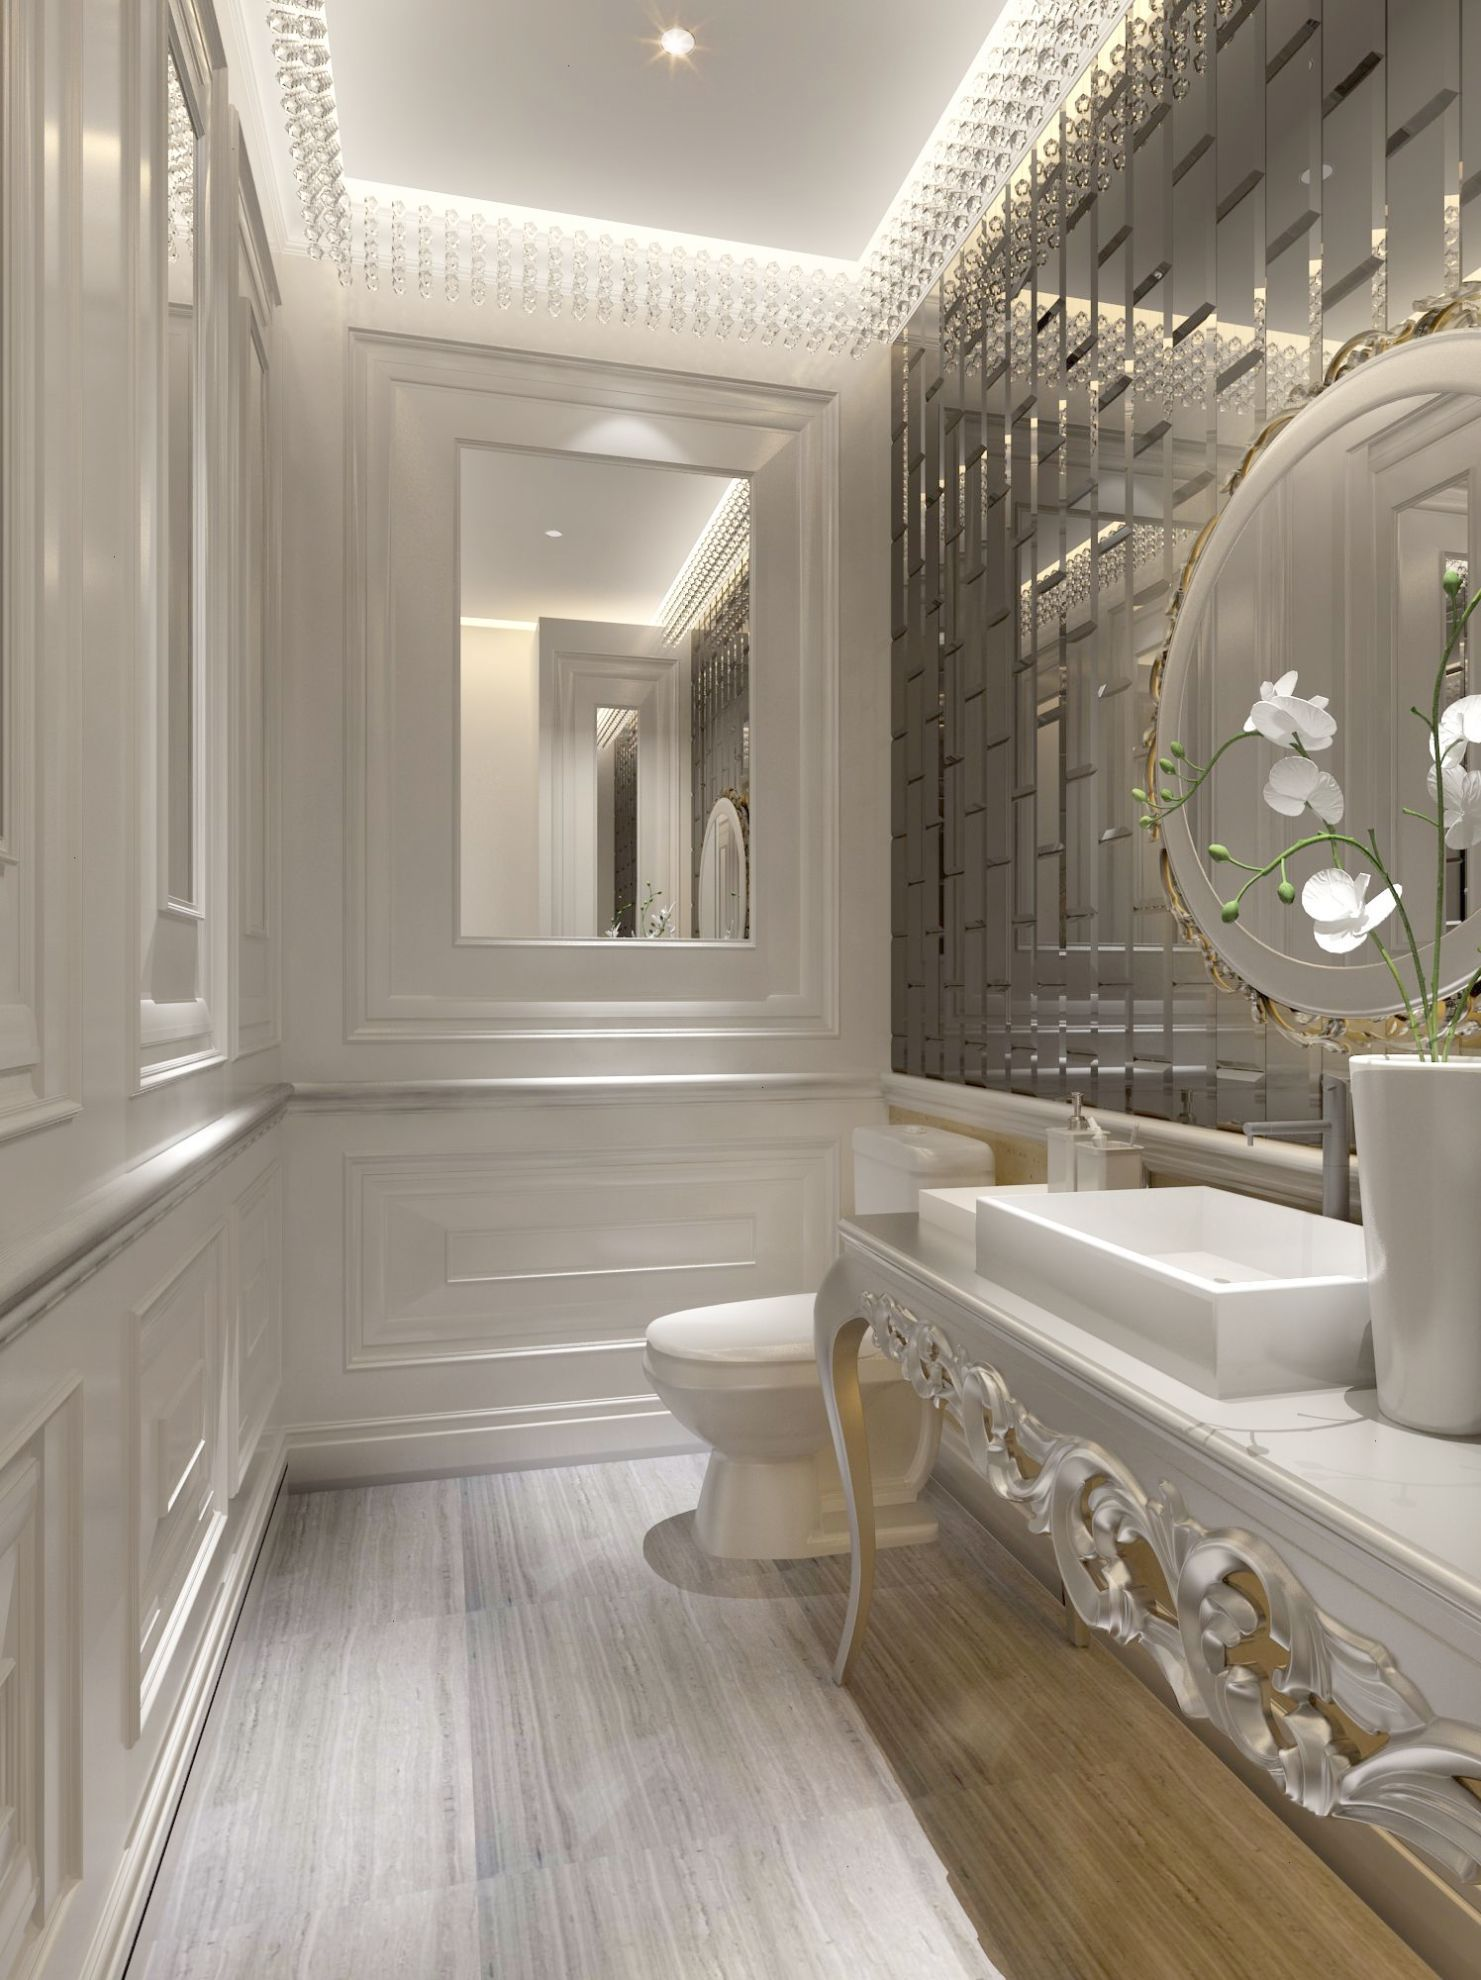 Neat Elegant Bathrooms Glasgow D Small Luxury Bathrooms